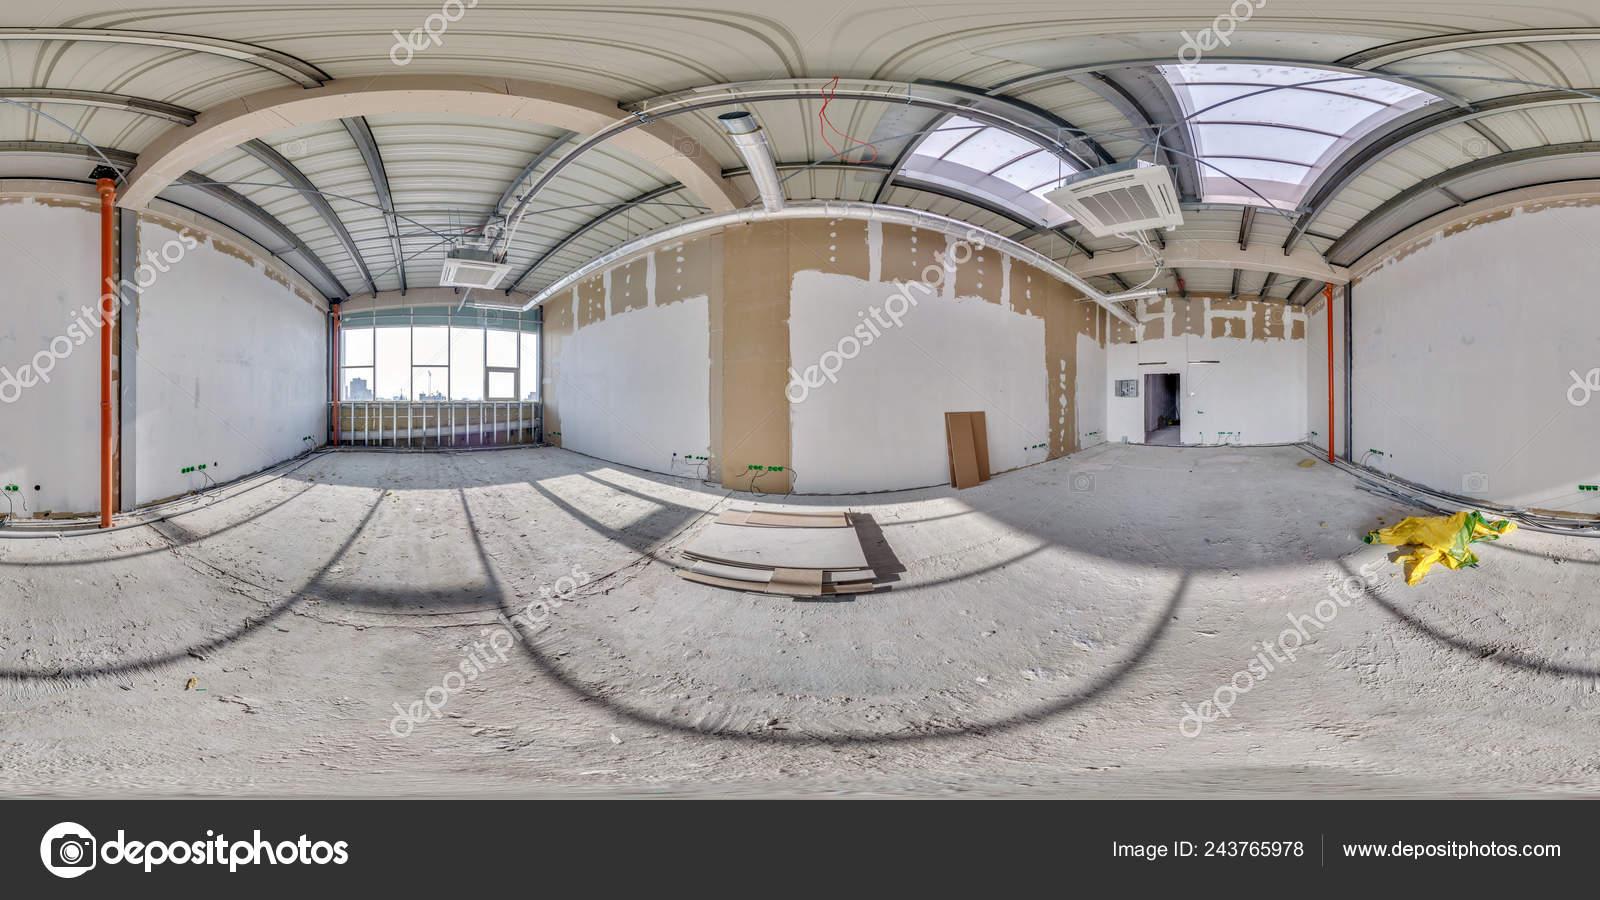 Full Seamless Spherical Hdri Panorama 360 Angle View Interior Empty